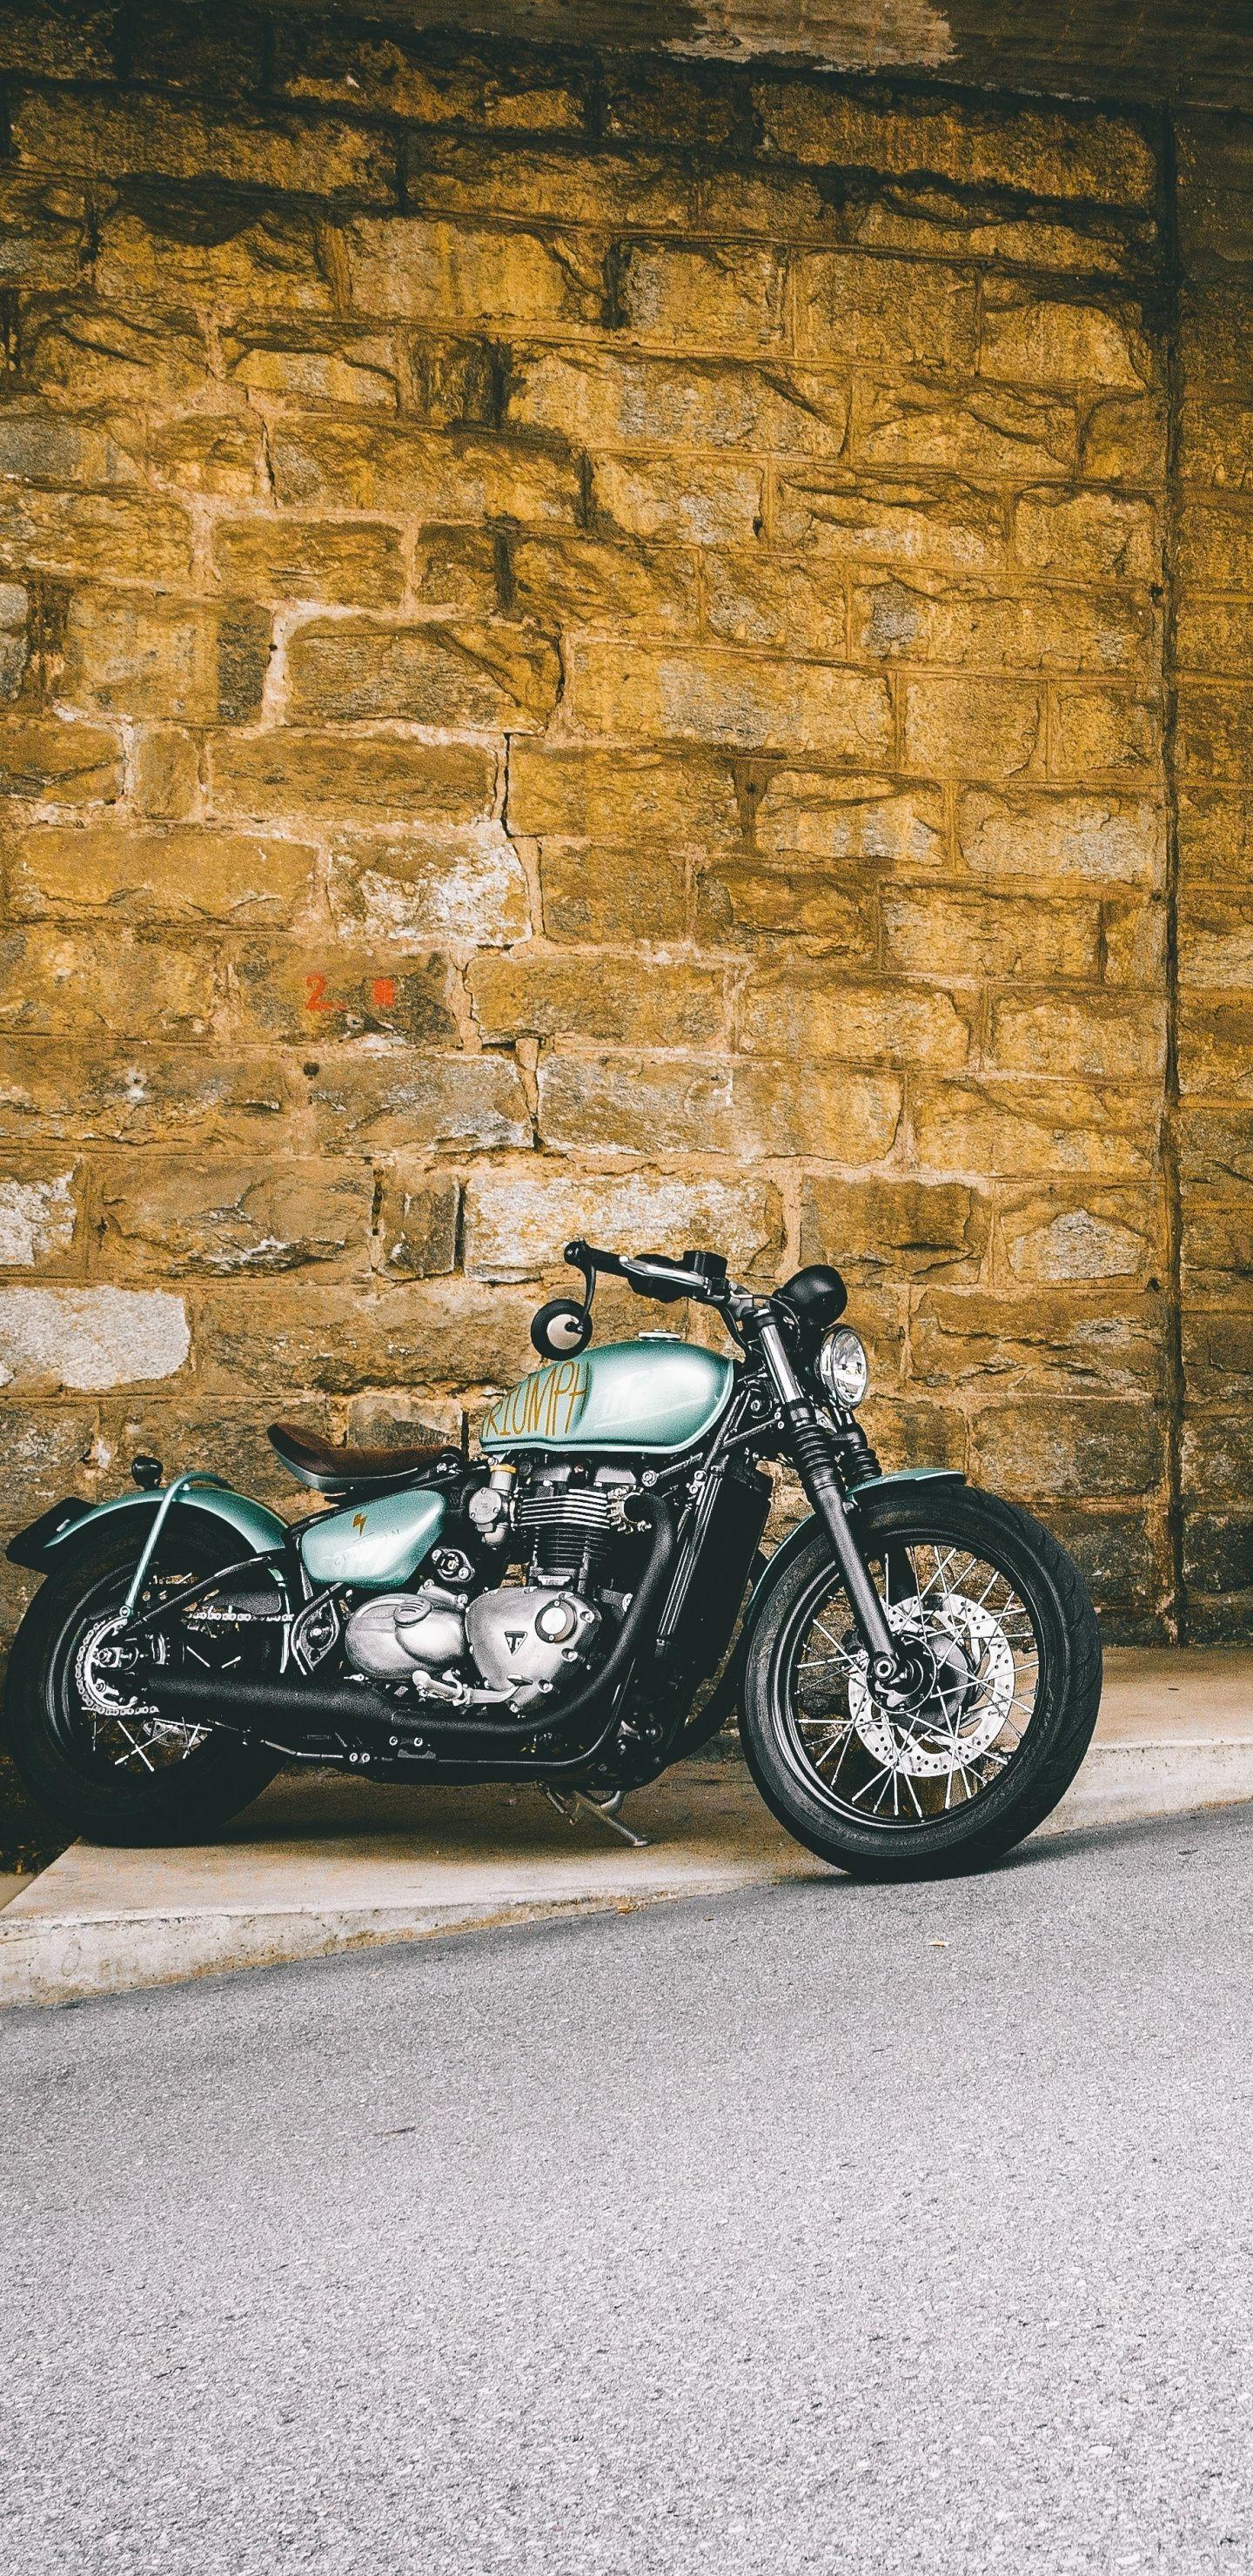 Motorcycle Street 1440x2960 Wallpaper Motorcycle Wallpaper Motorcycle Bobber Motorcycle